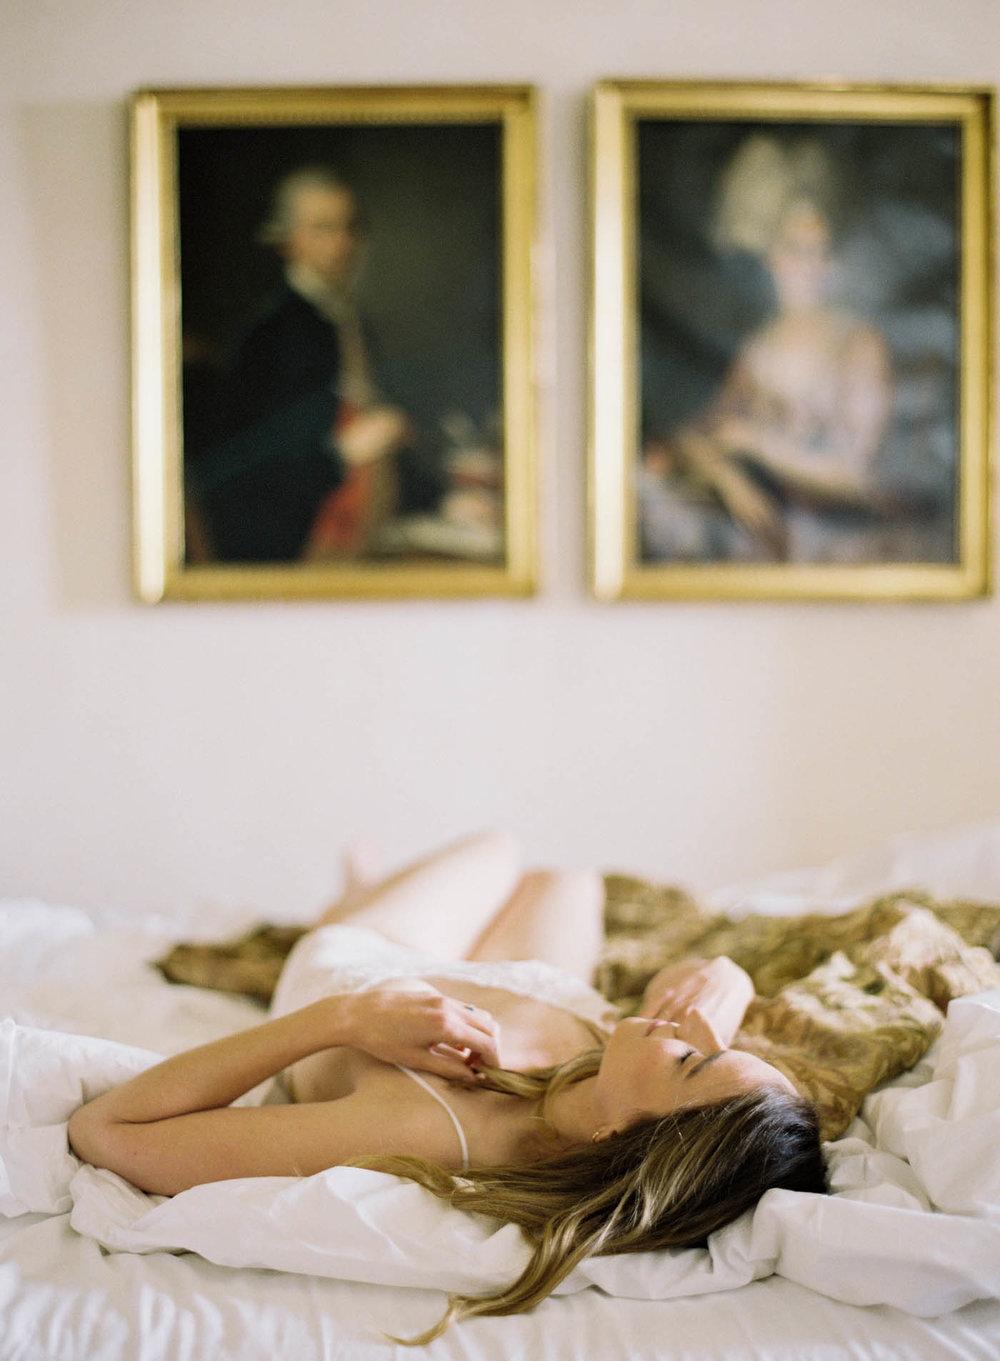 Italian_Villa_Boudoir-4-Jen_Huang-Elan_Jaffke_Boudoir-121-Jen_Huang-006878-R1-007.jpg